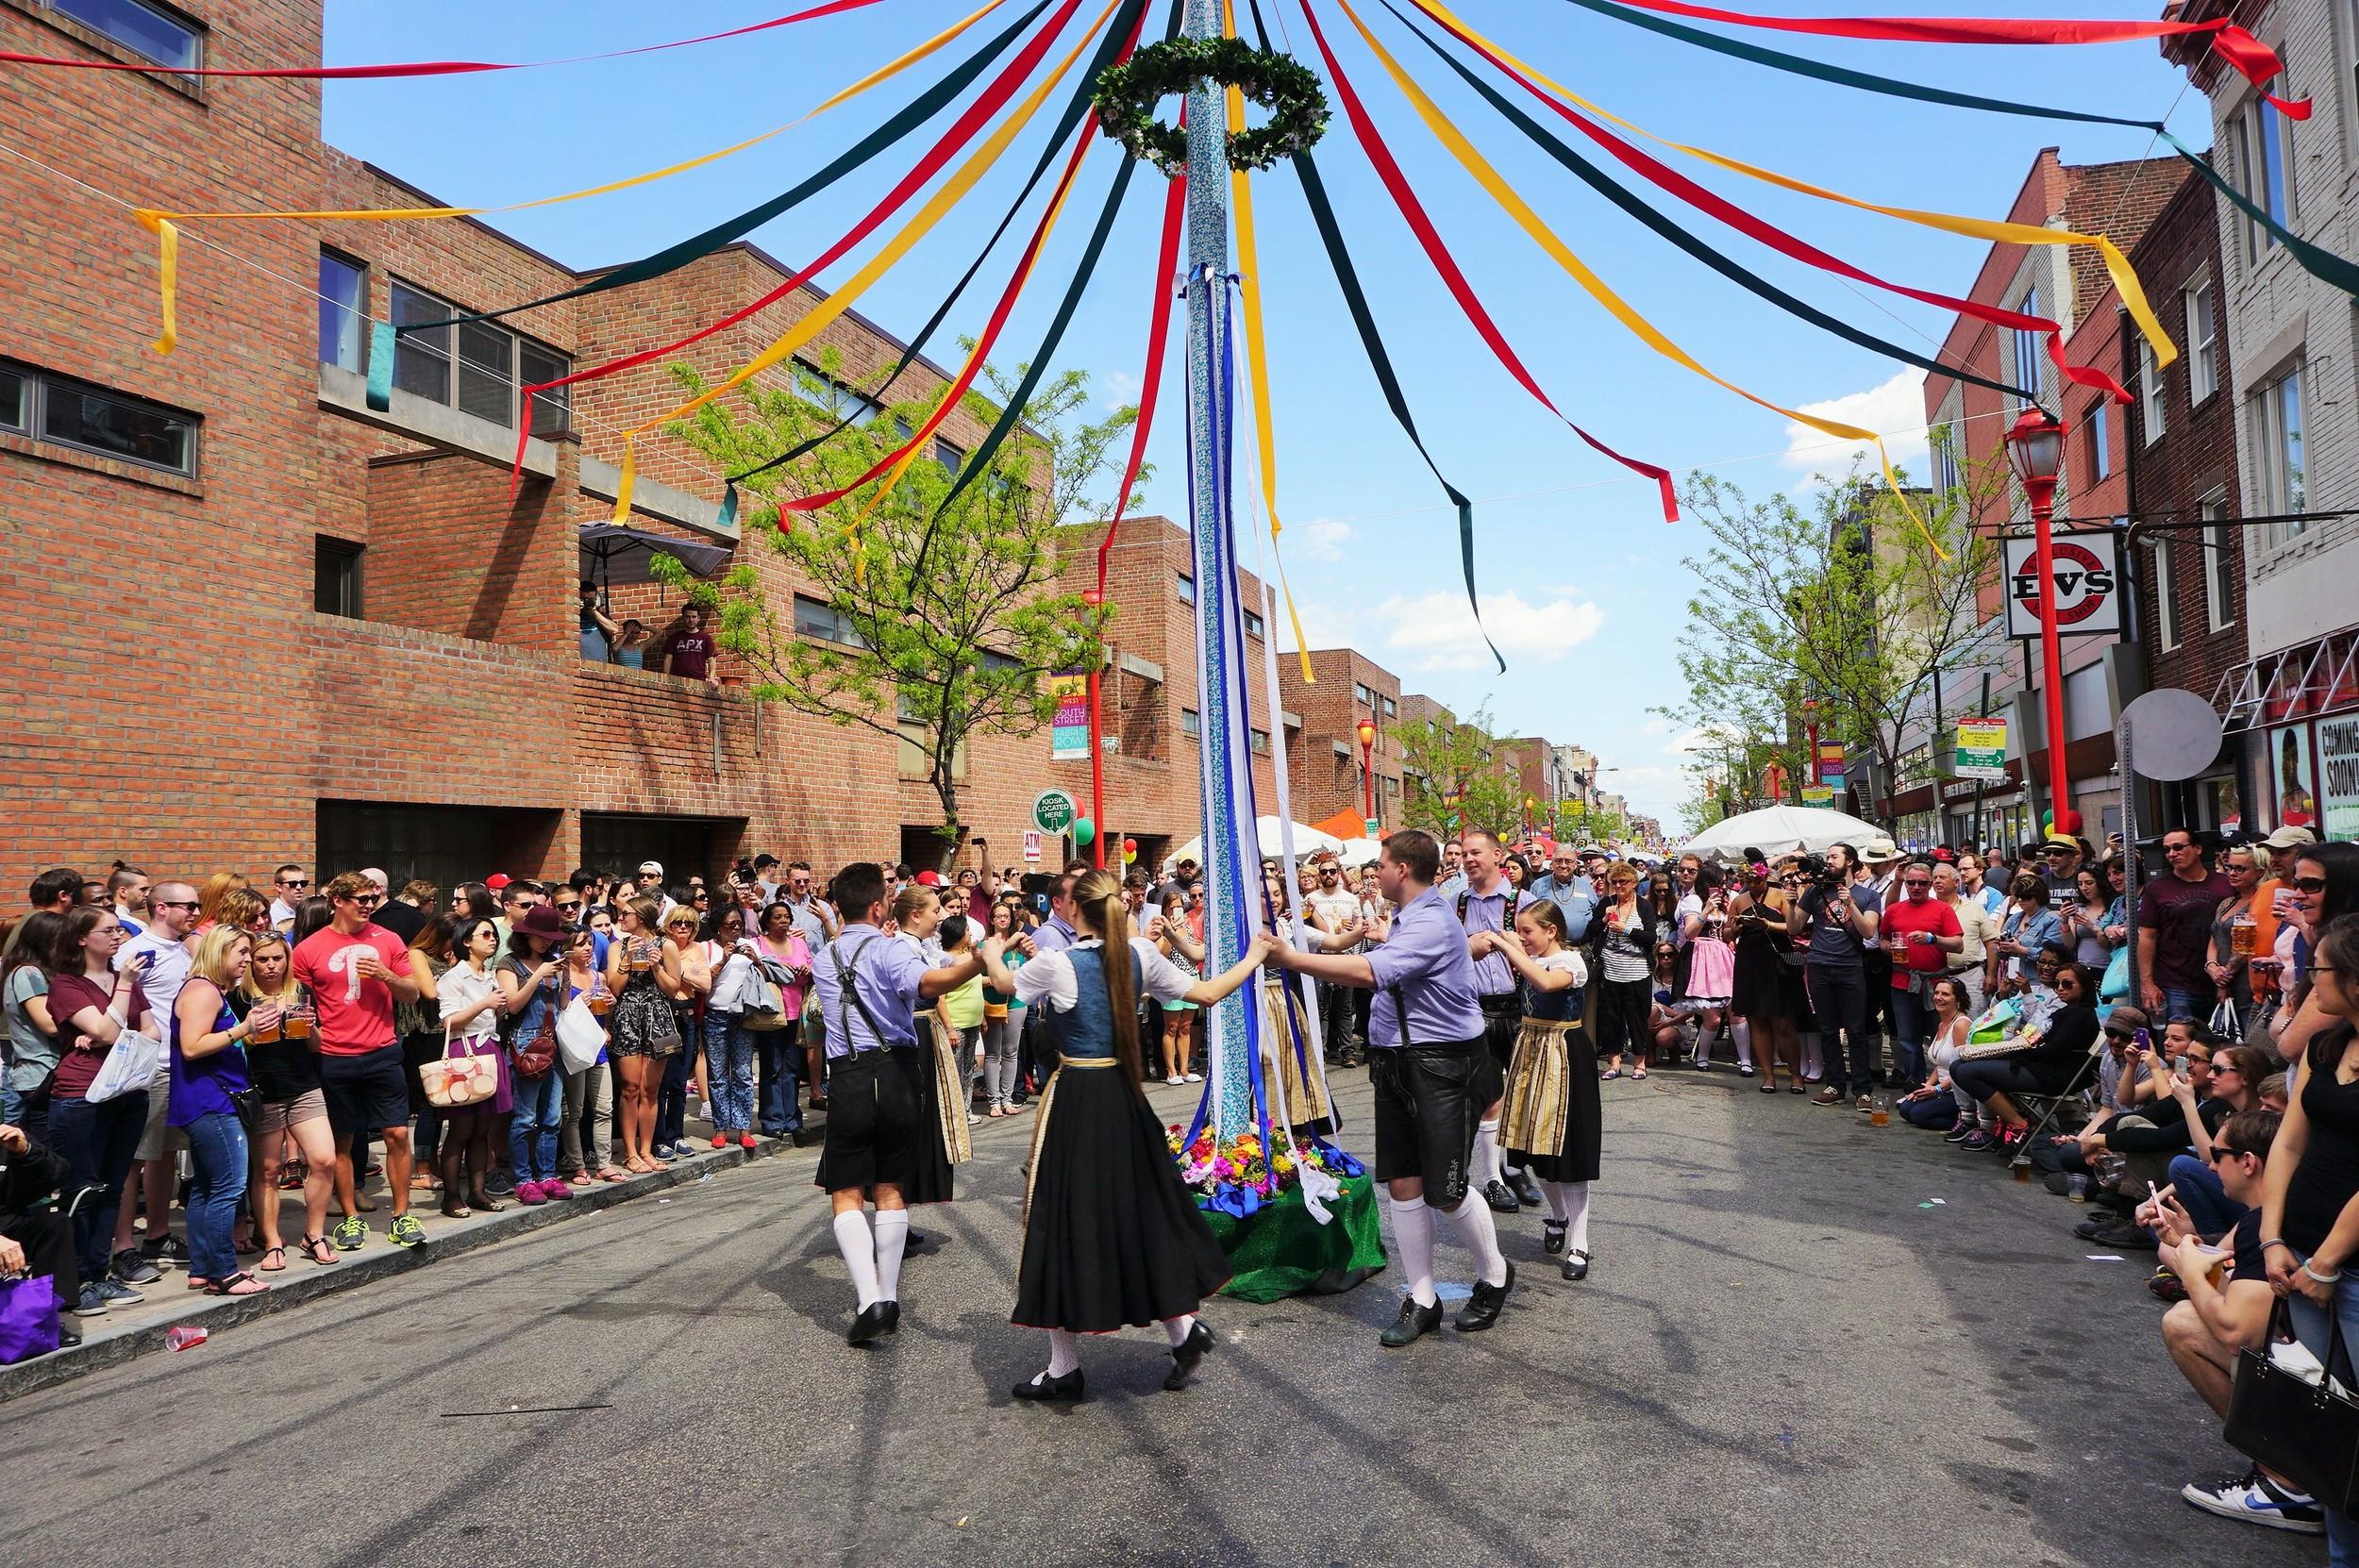 Maifest, Brauhaus Schmitz, South Street, Spring Festival, South STreet Spring Festival